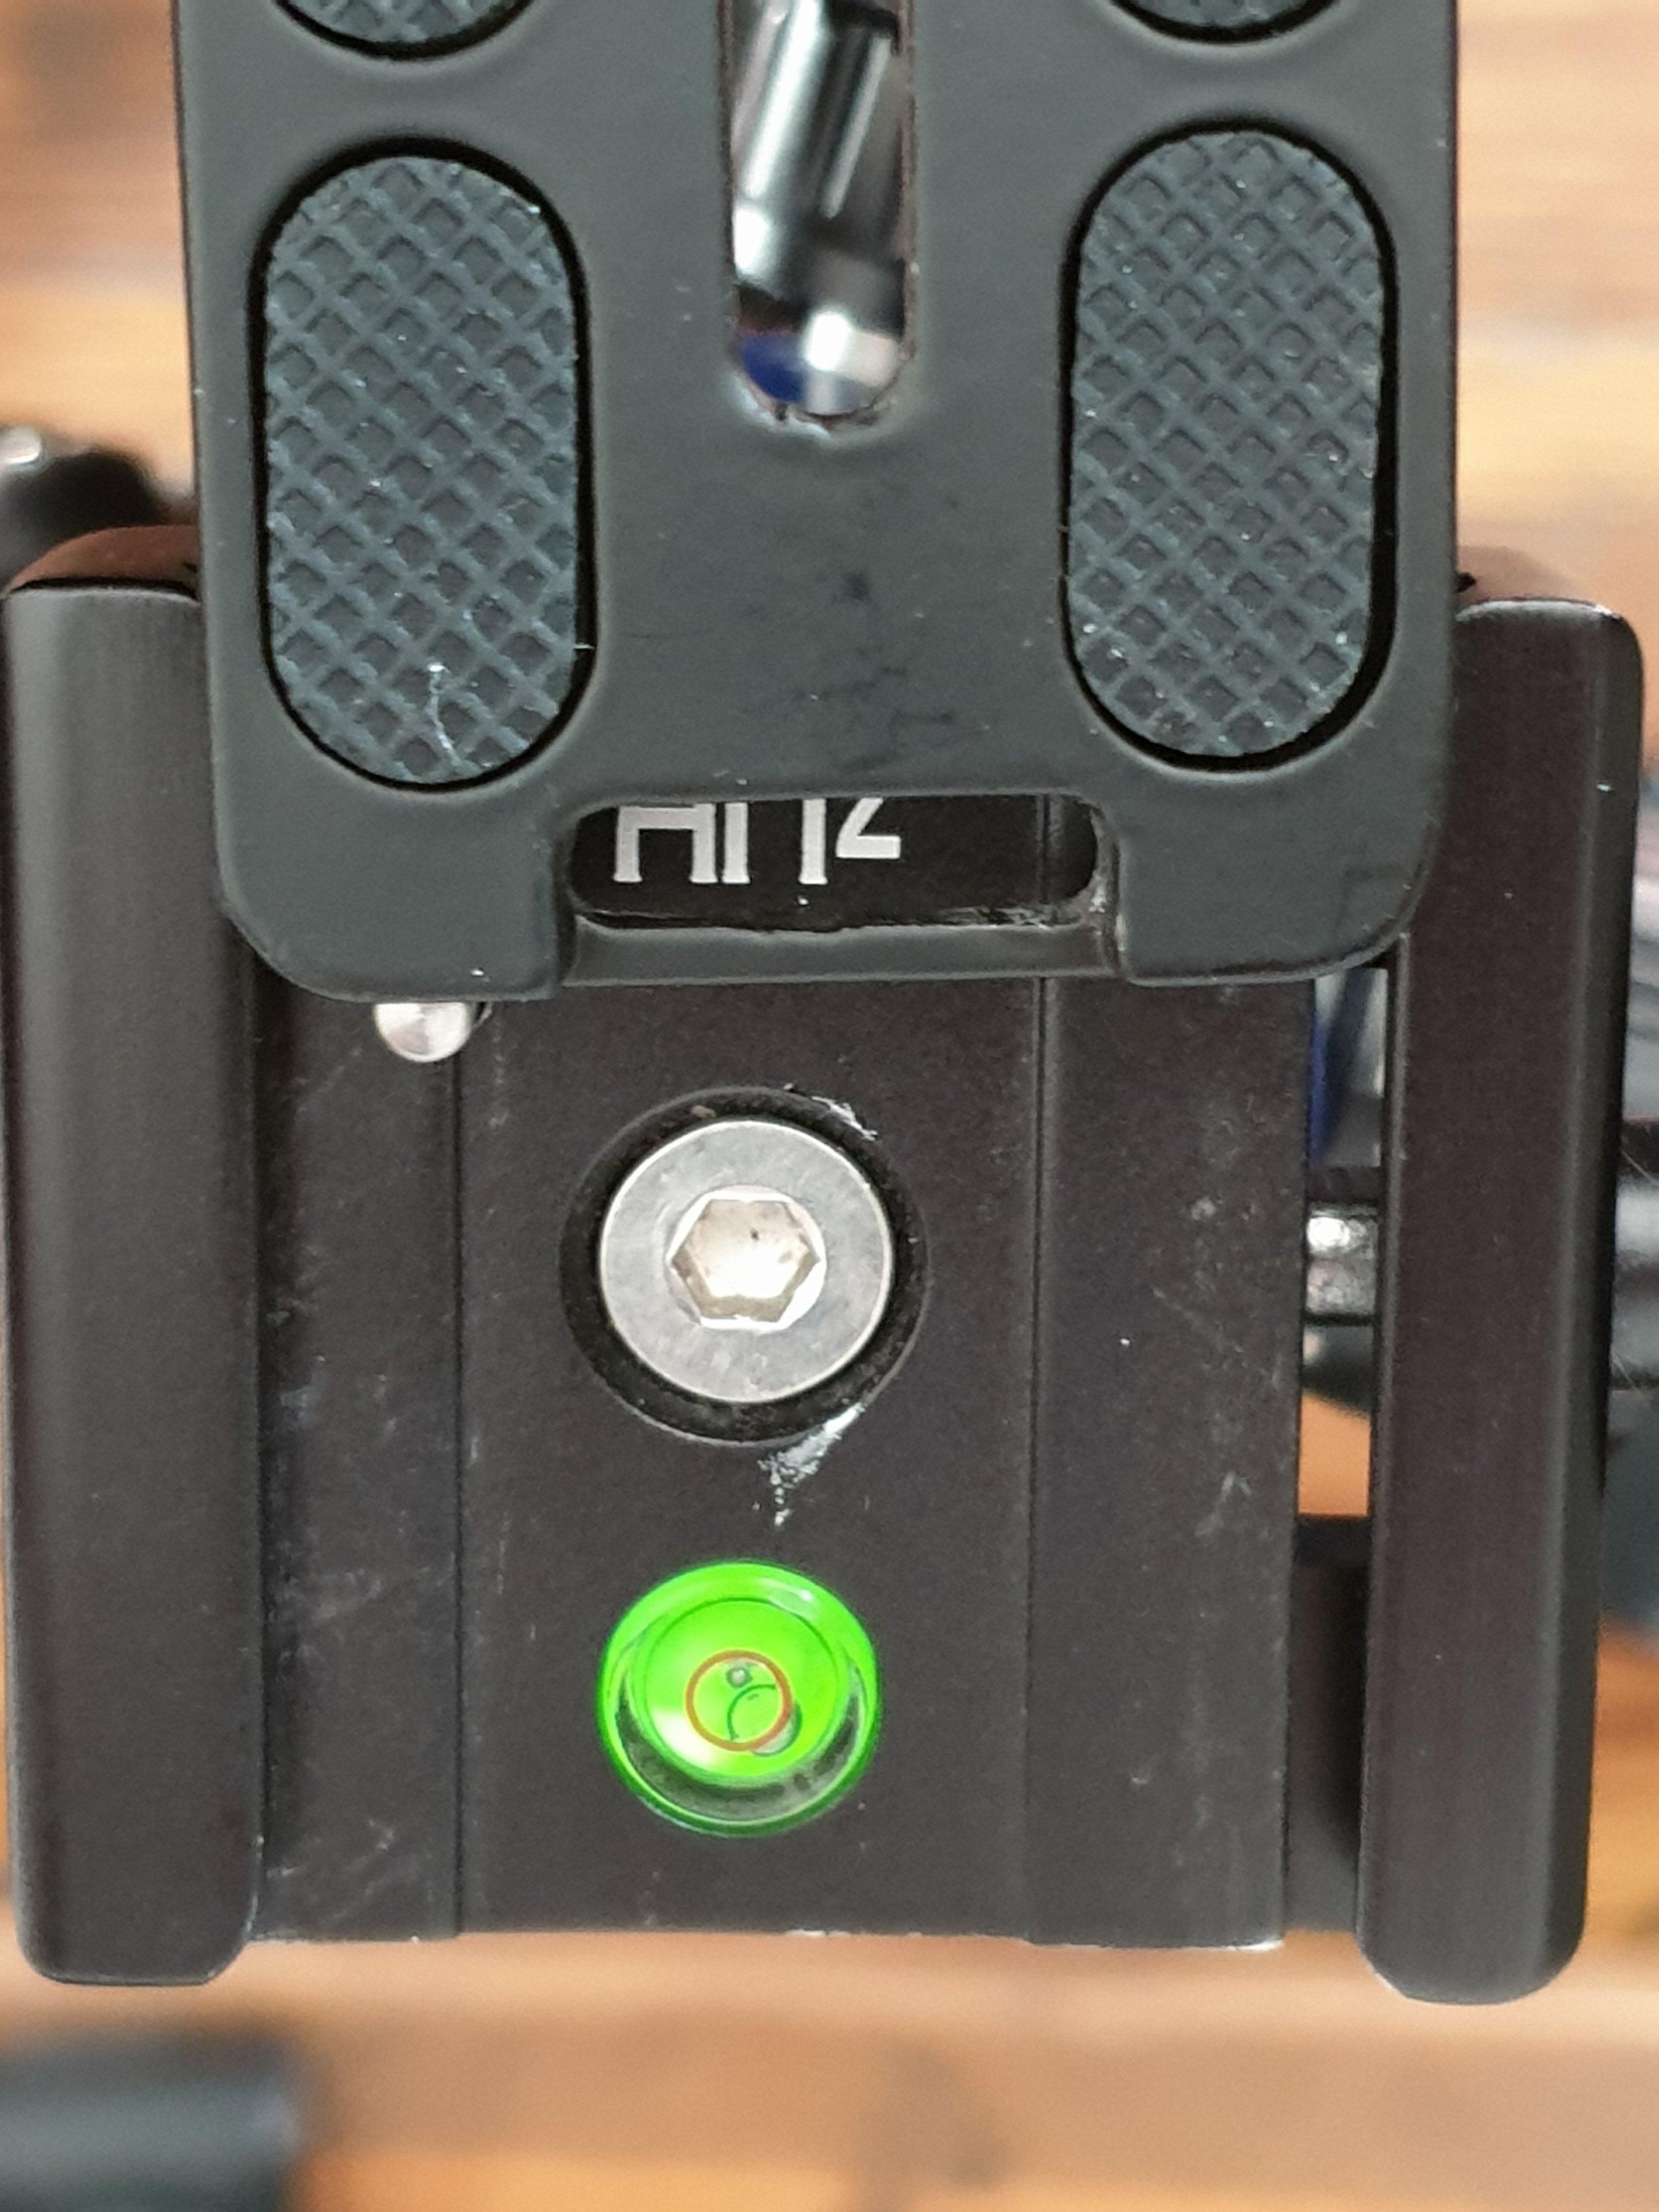 Andoer L bracket on 3LT tripod AH2 ball head showing locking pin